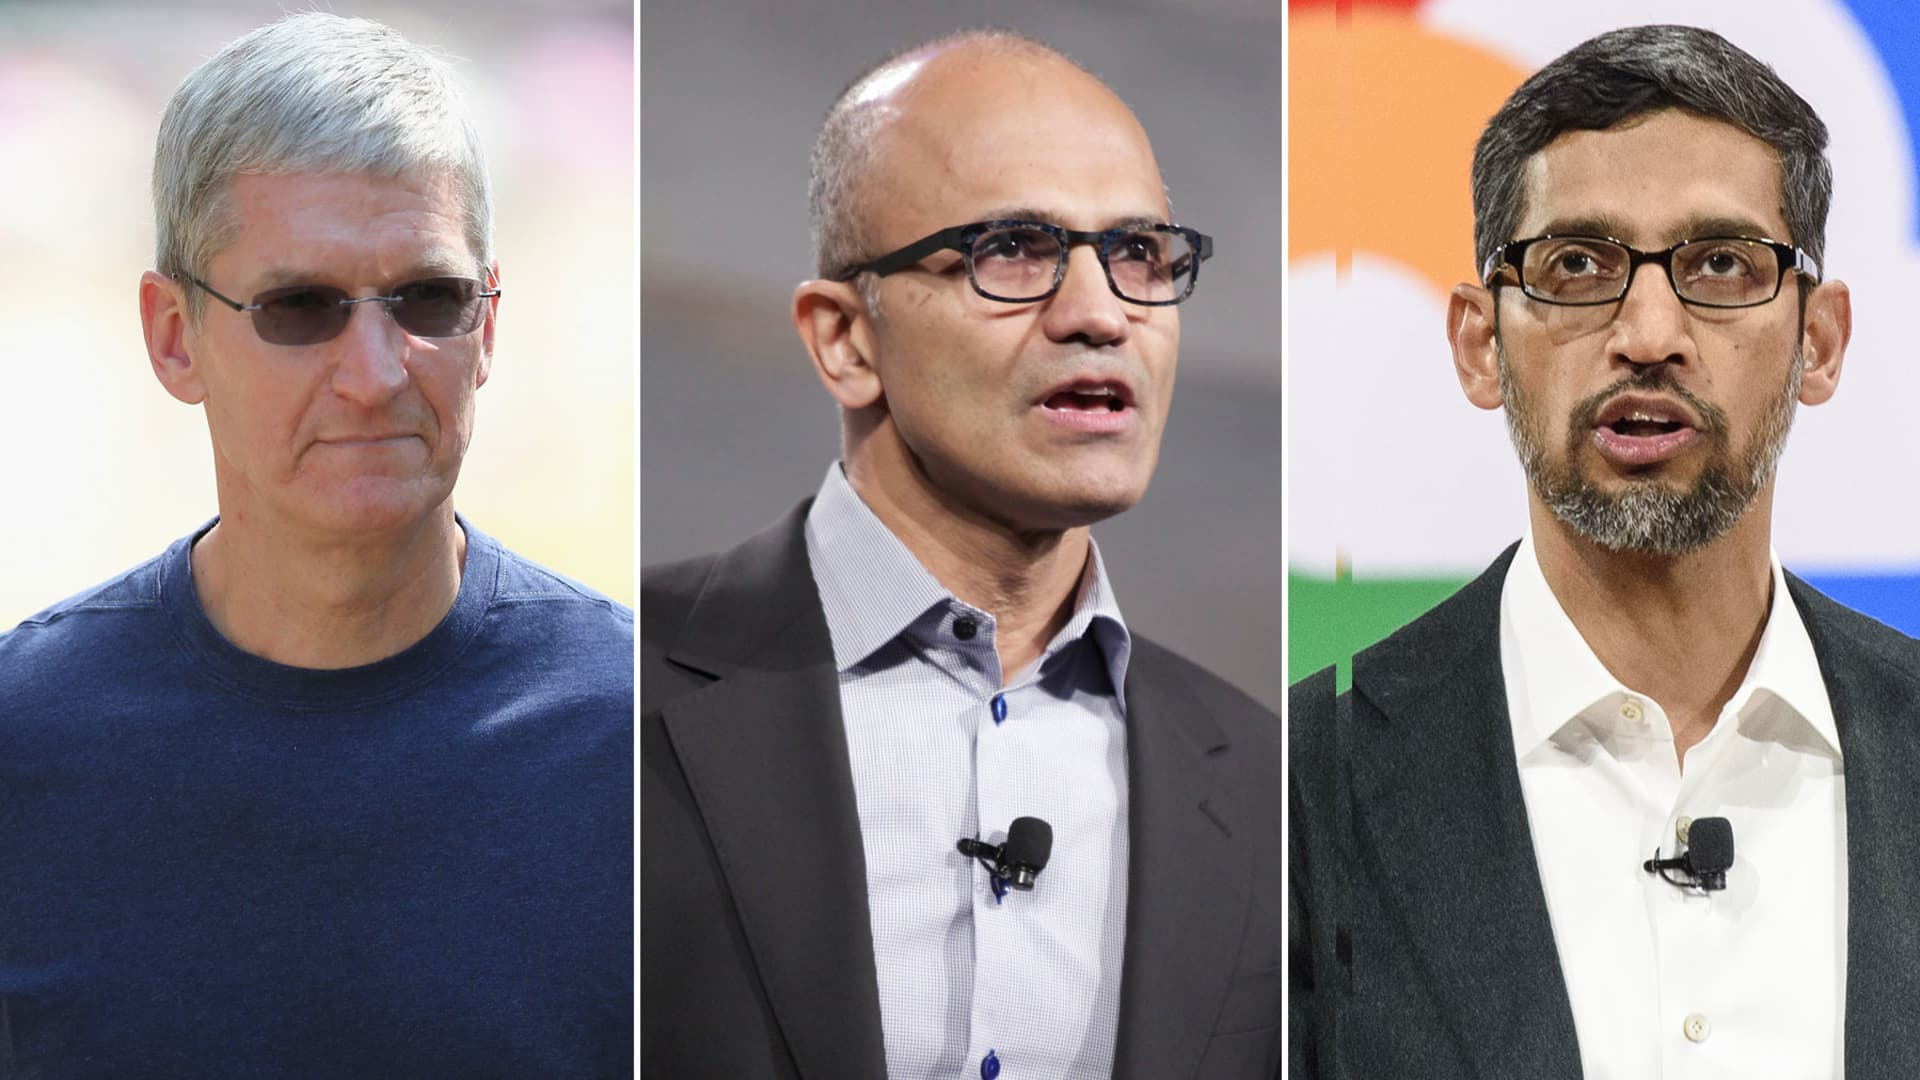 Tim Cook, CEO of Apple (L), Satya Nadella, CEO of Microsoft (C) and Sundar Pichai, CEO of Google.